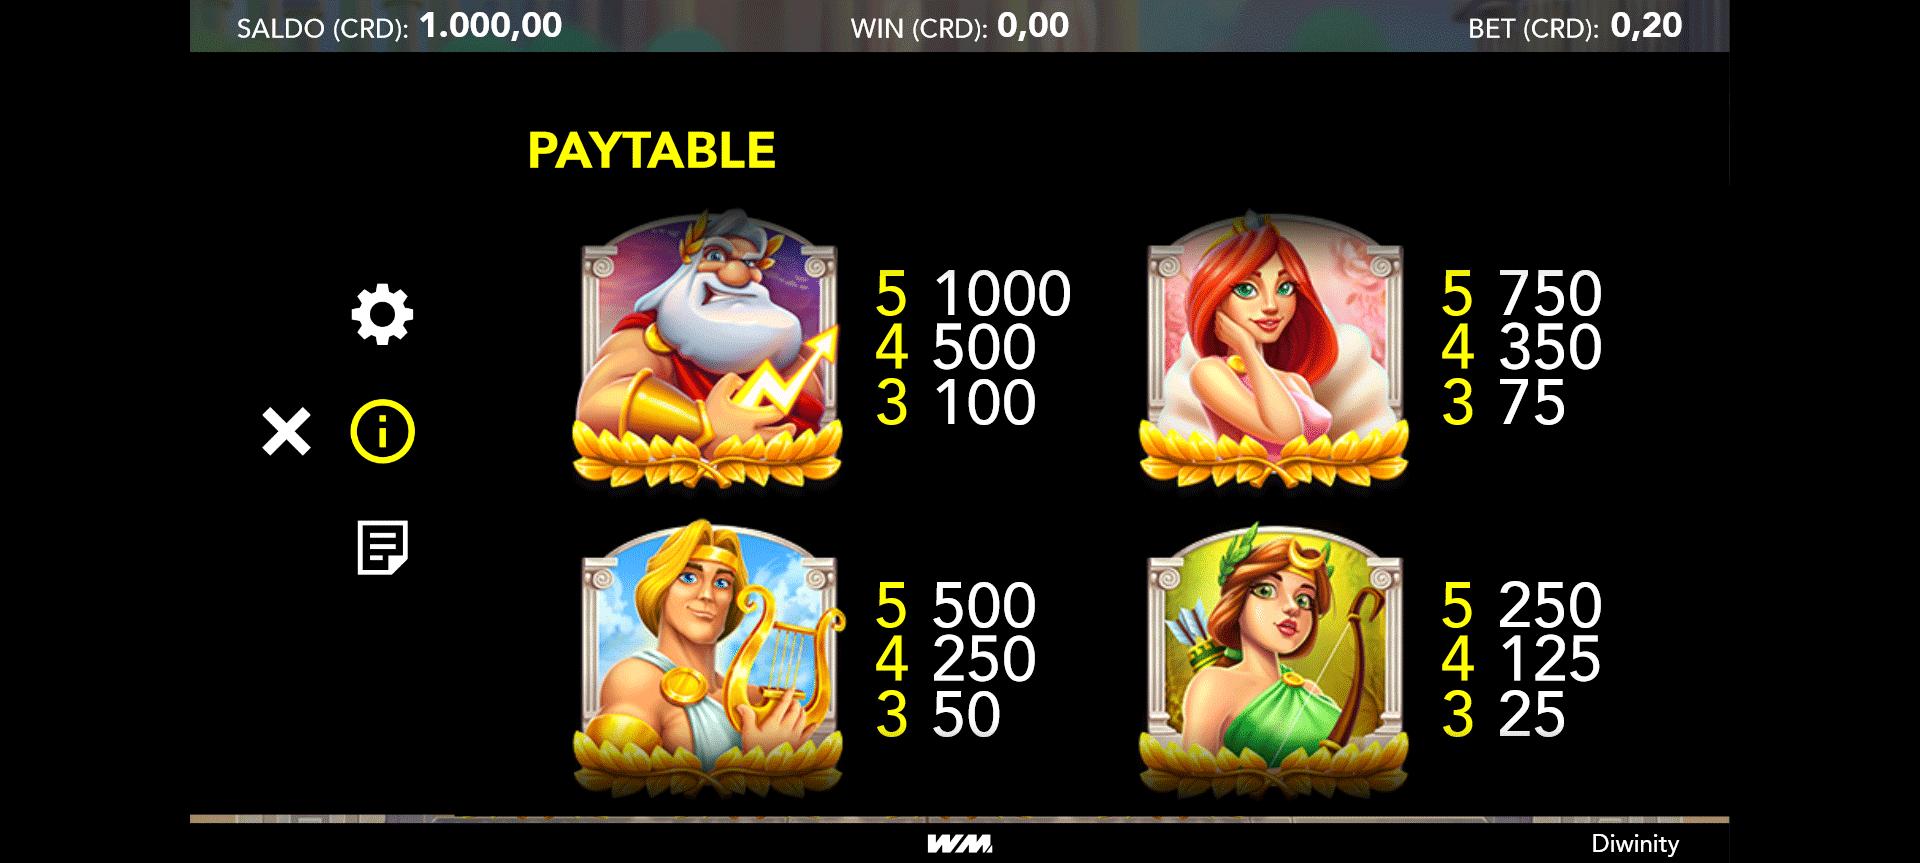 simboli del gioco slot online diwinity